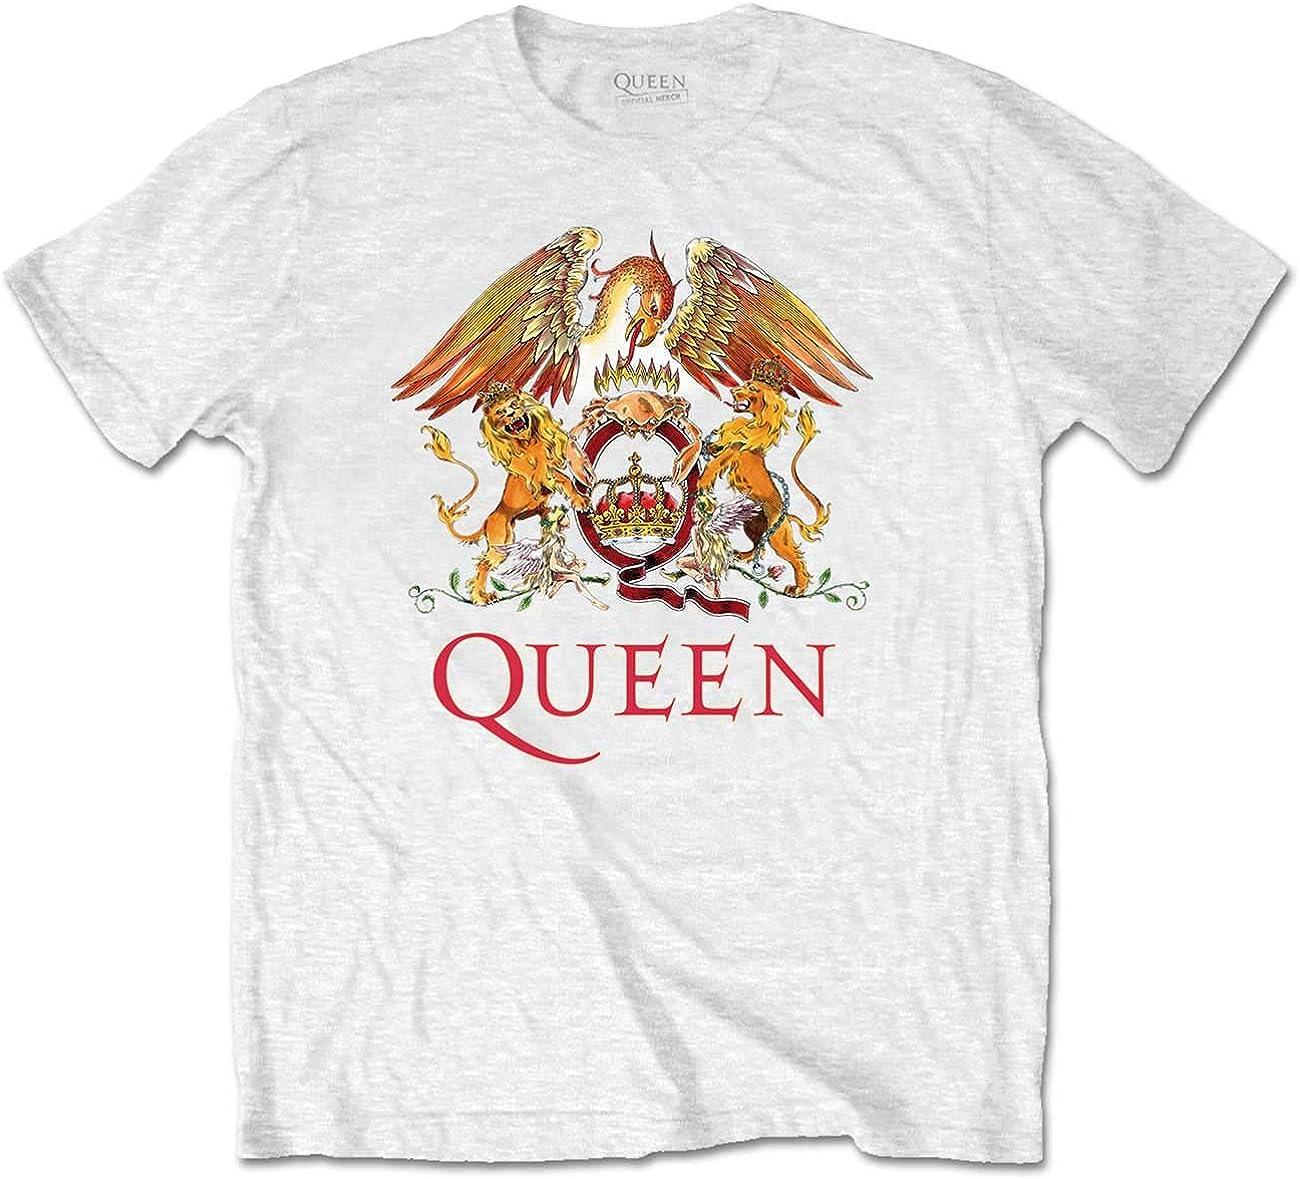 Ladies Queen Crest Freddie Mercury Brian May Official Tee T-Shirt Womens Girls